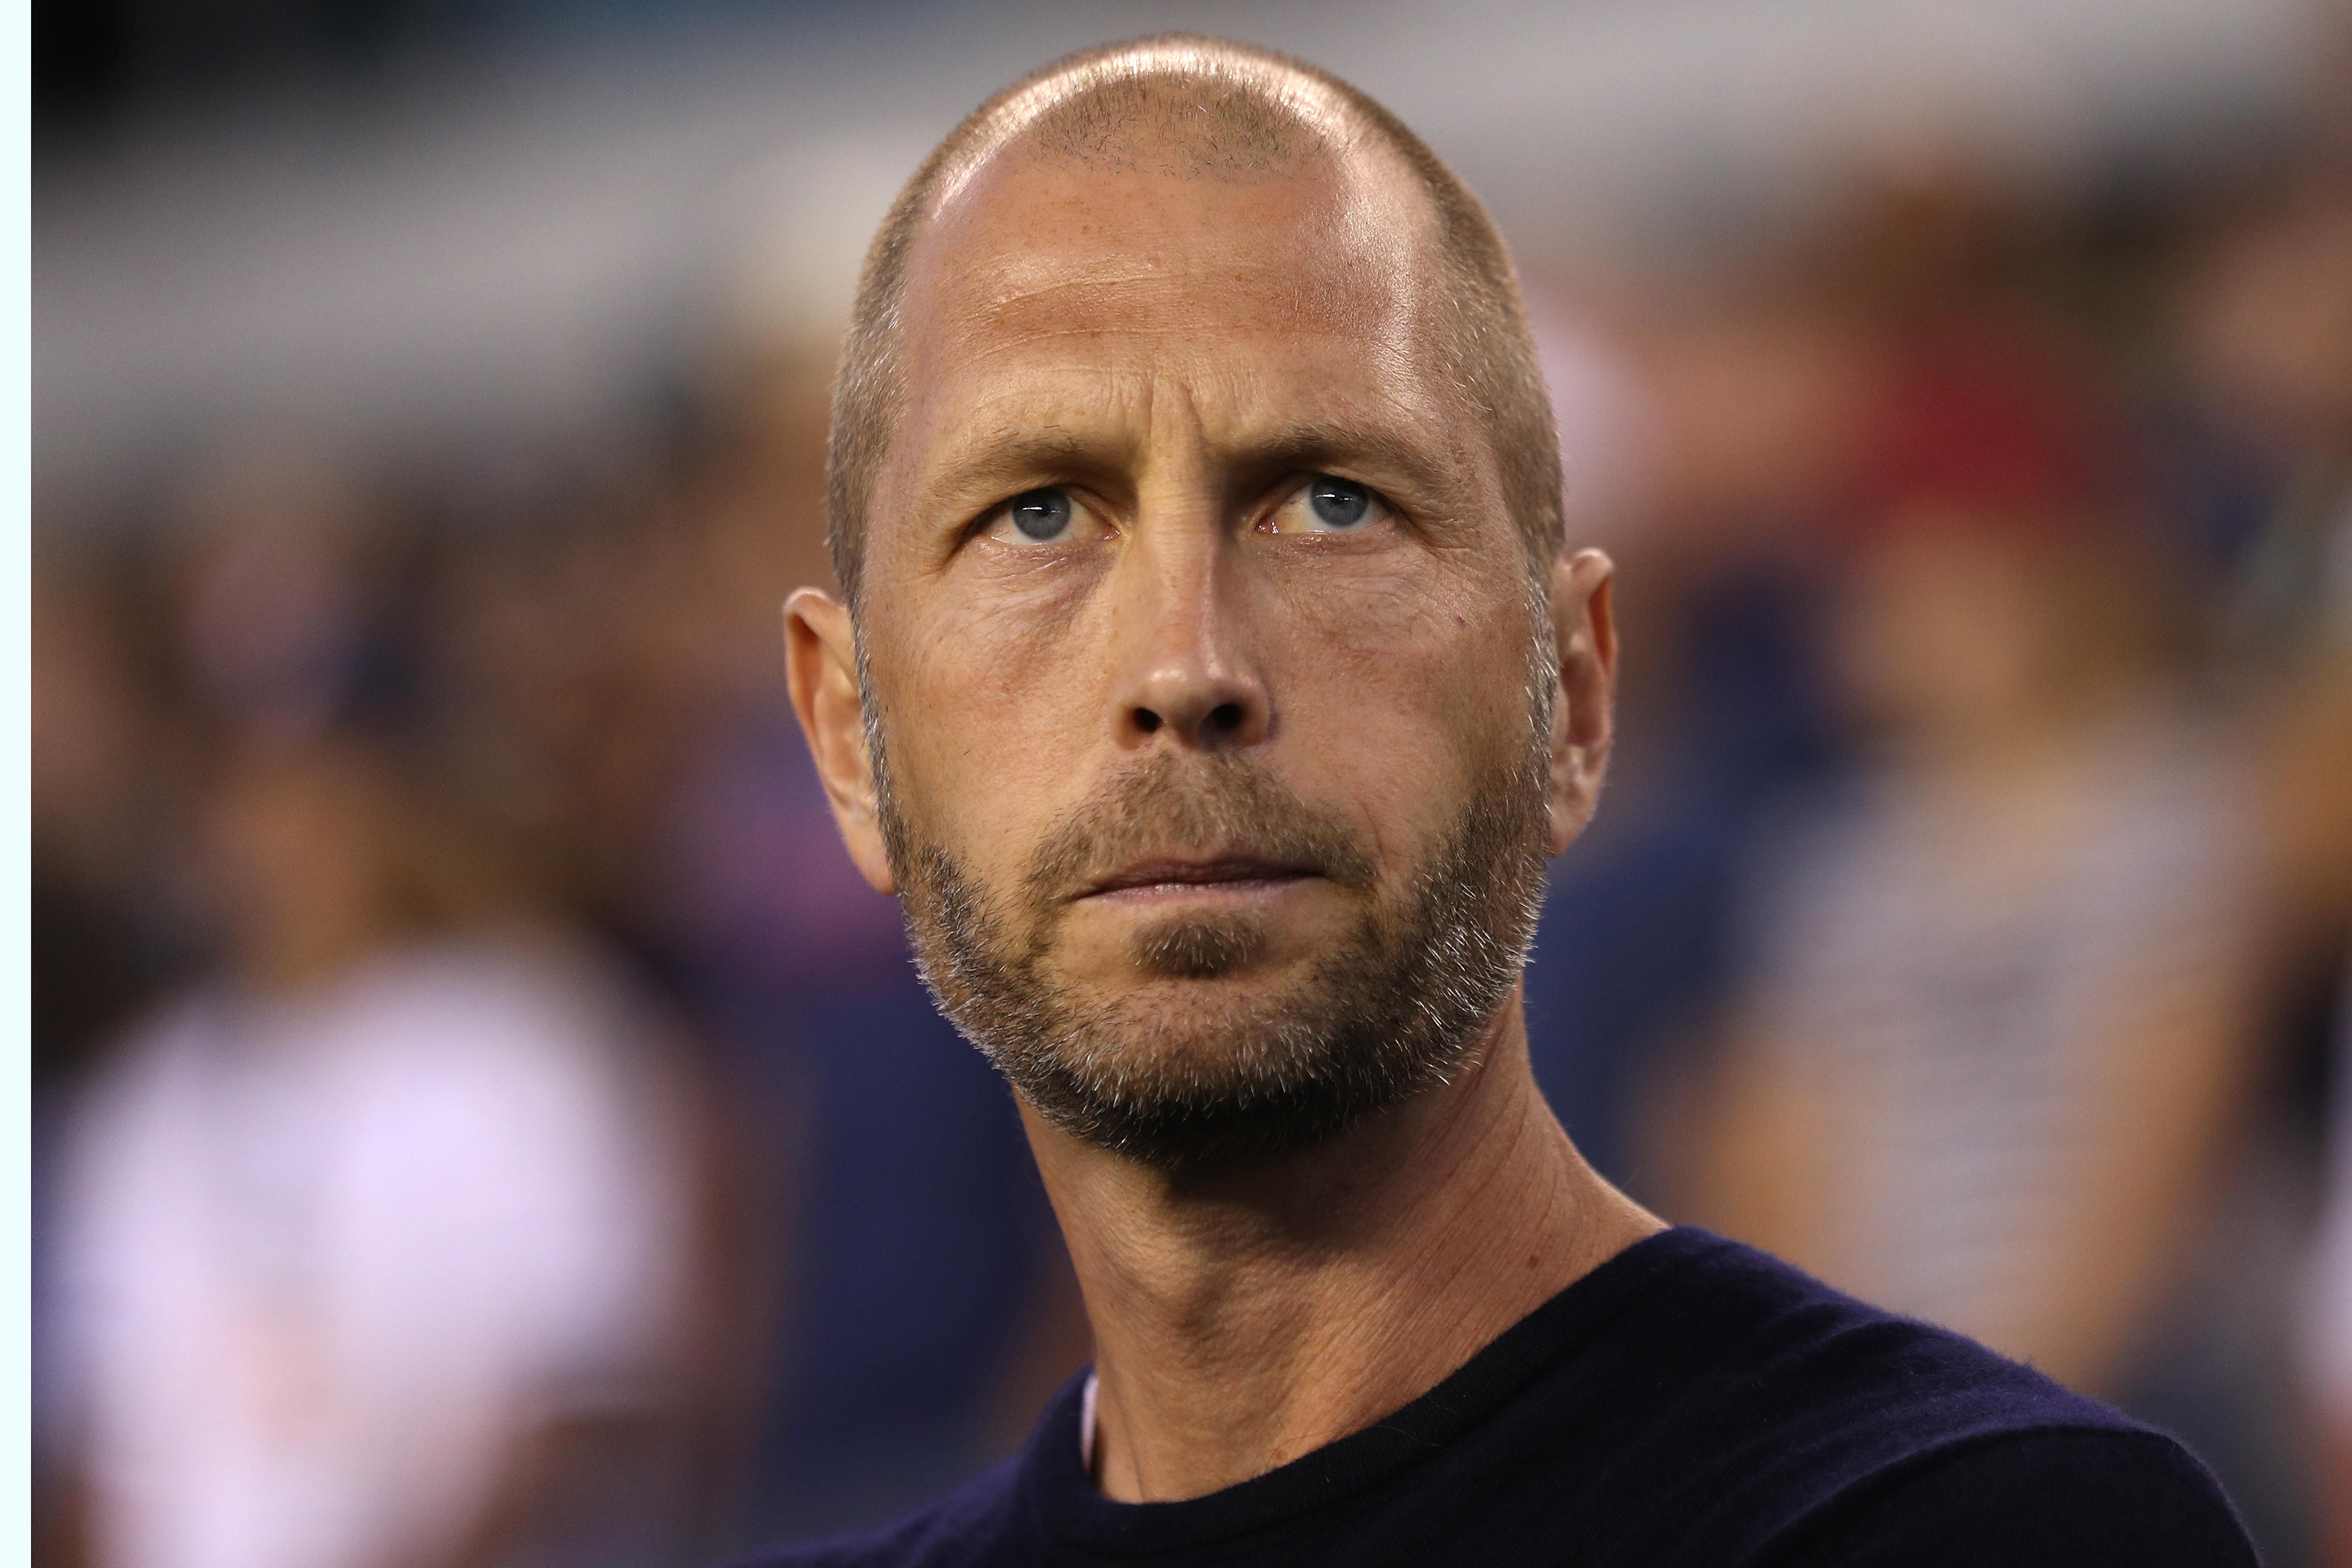 USMNT boss Berhalter could coach in Bundesliga - Wolfsburg's Schafer